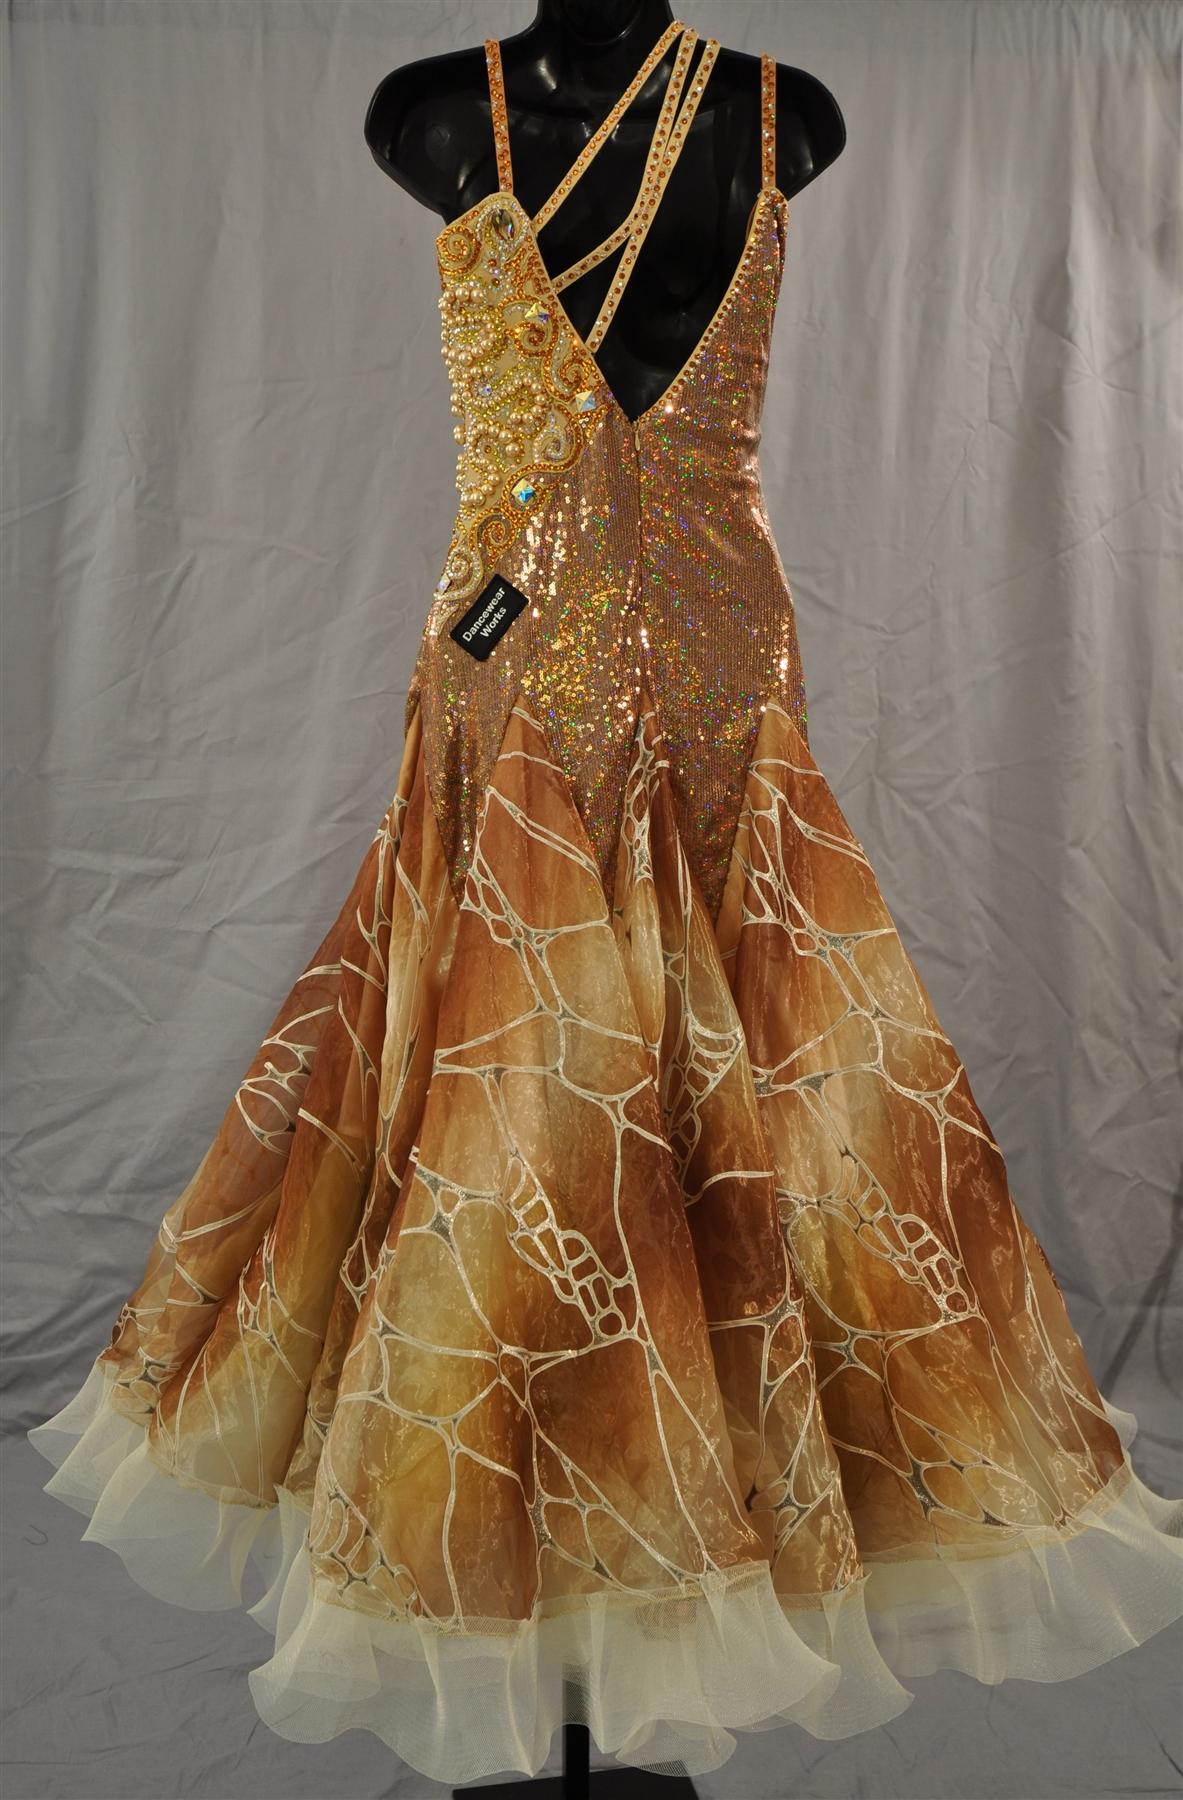 Gold Ballroom Dress With Dramatic Swarovski Stones And